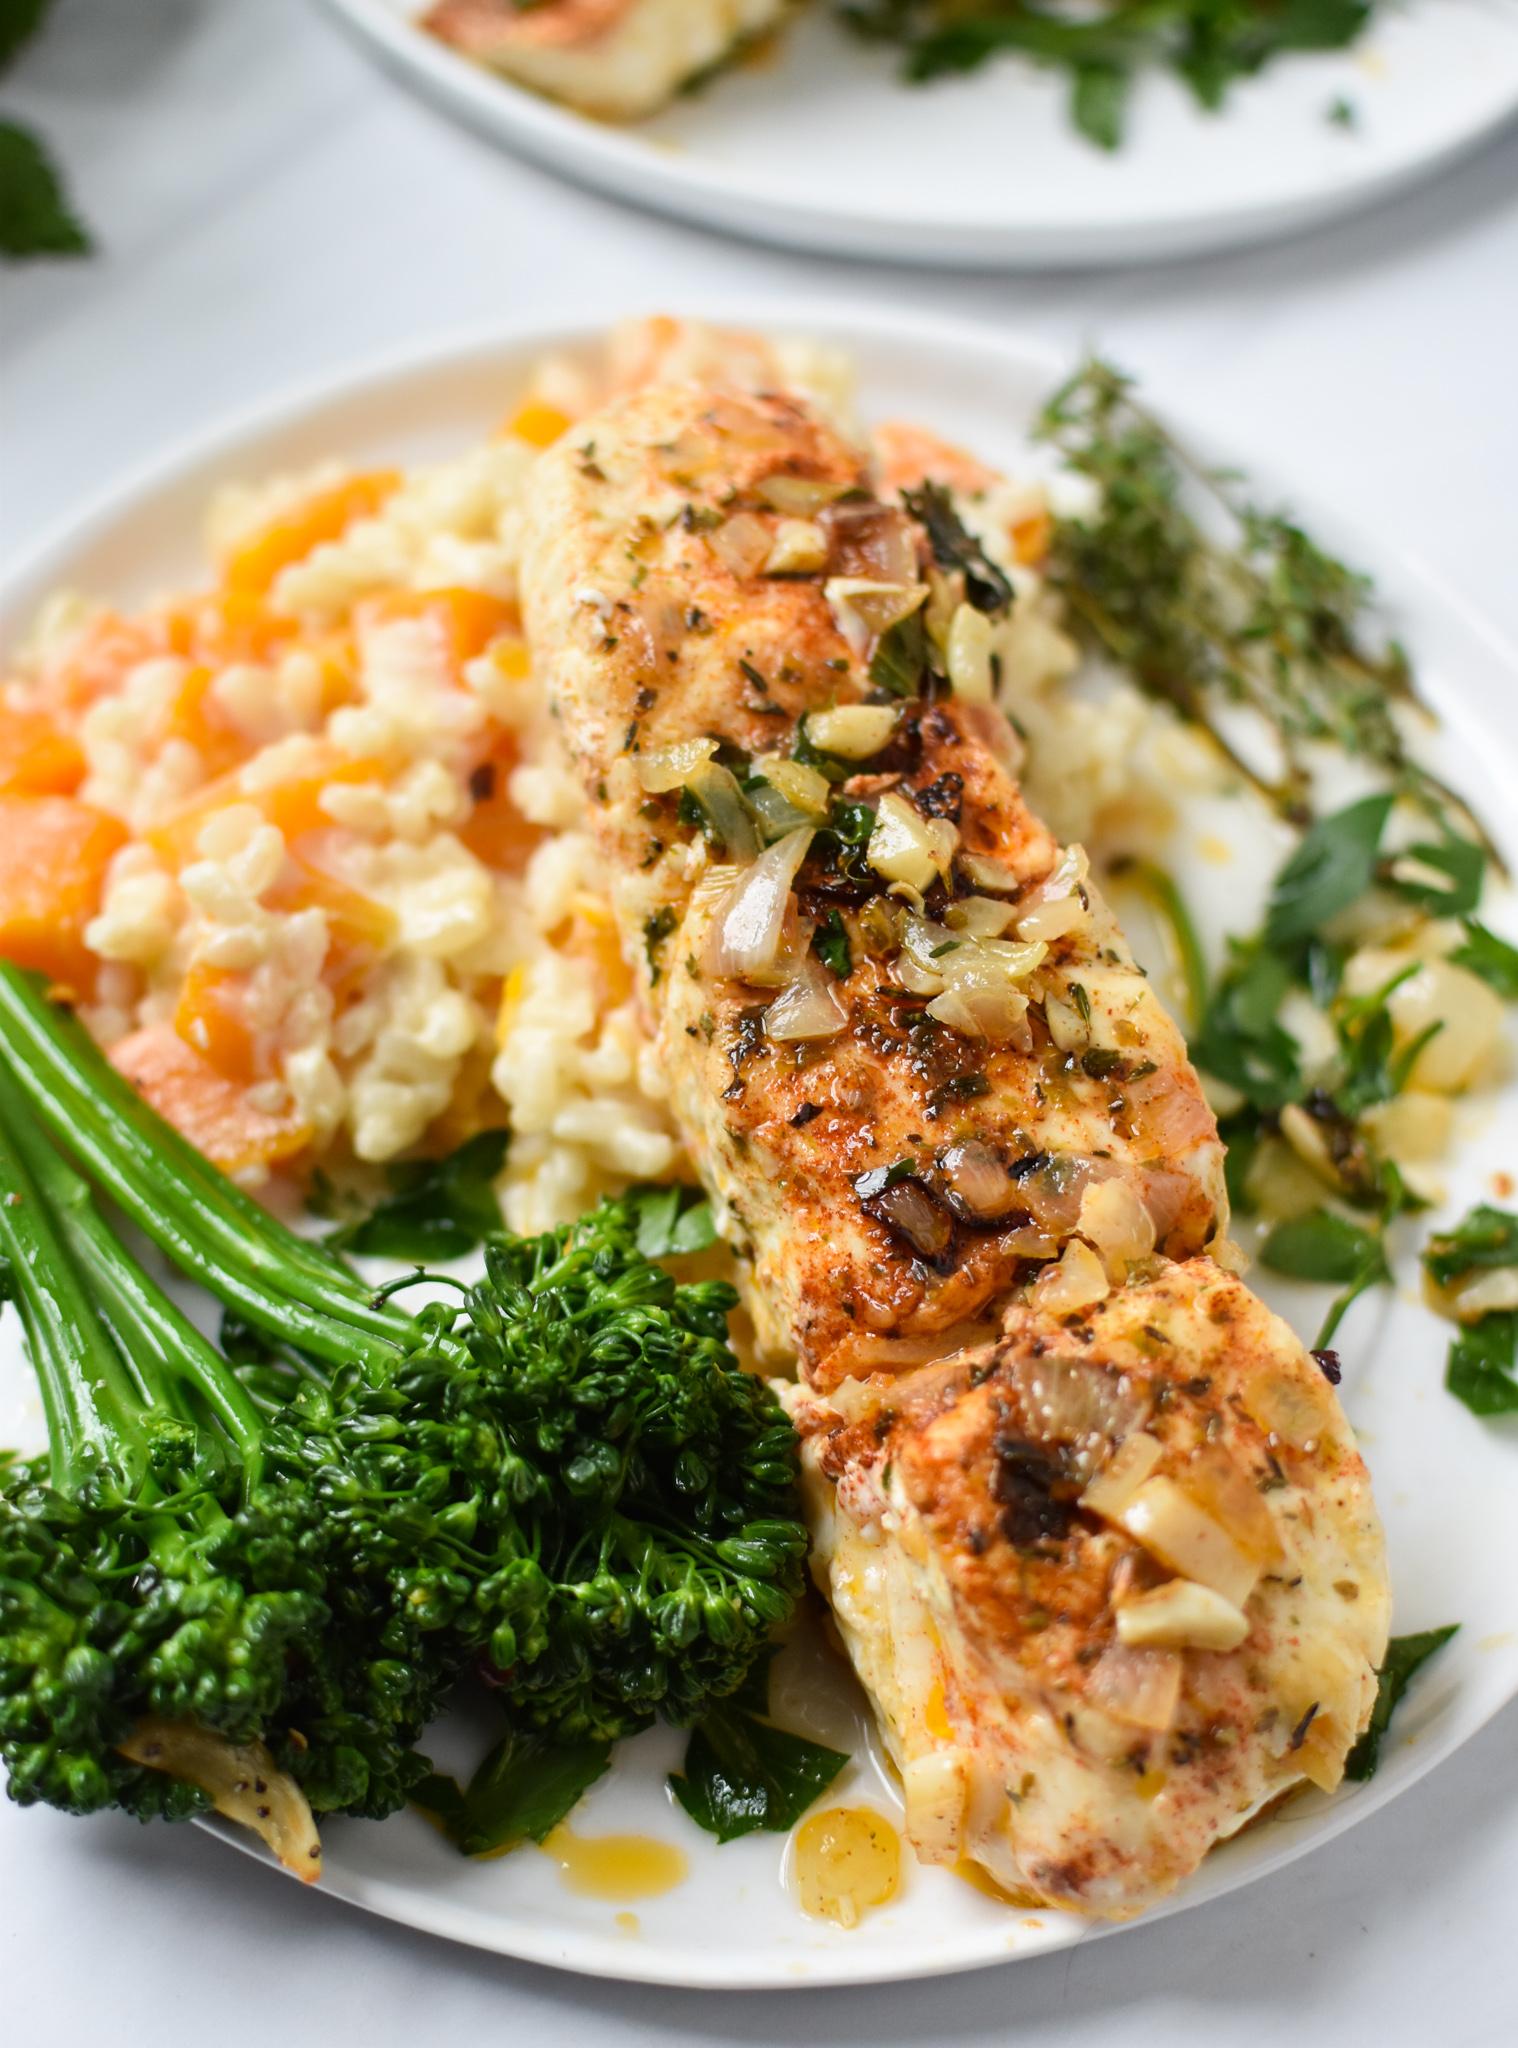 Lemon Garlic Halibut Recipe with broccoli on plate.